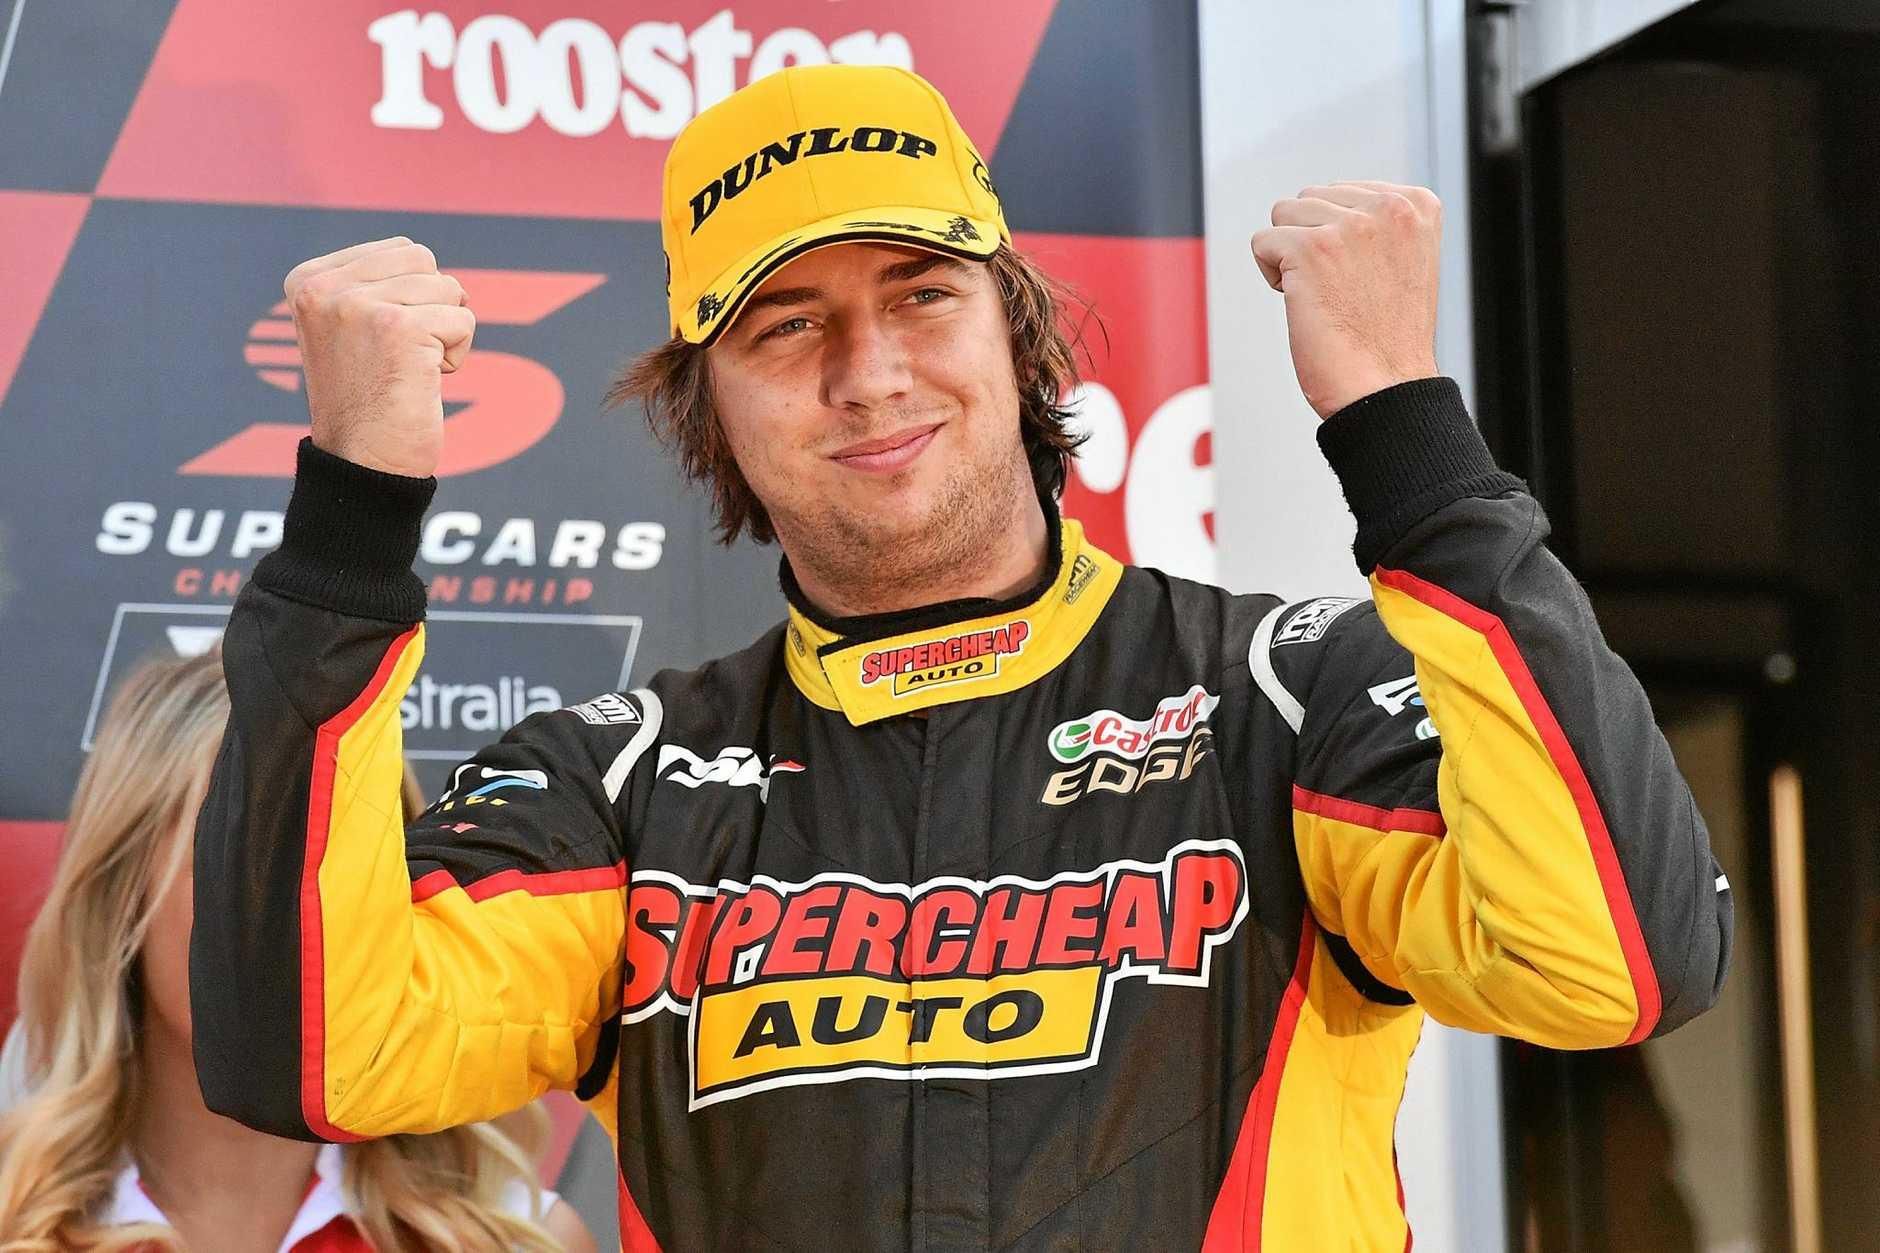 Chaz Mostert set a new lap record at Queensland Raceway.